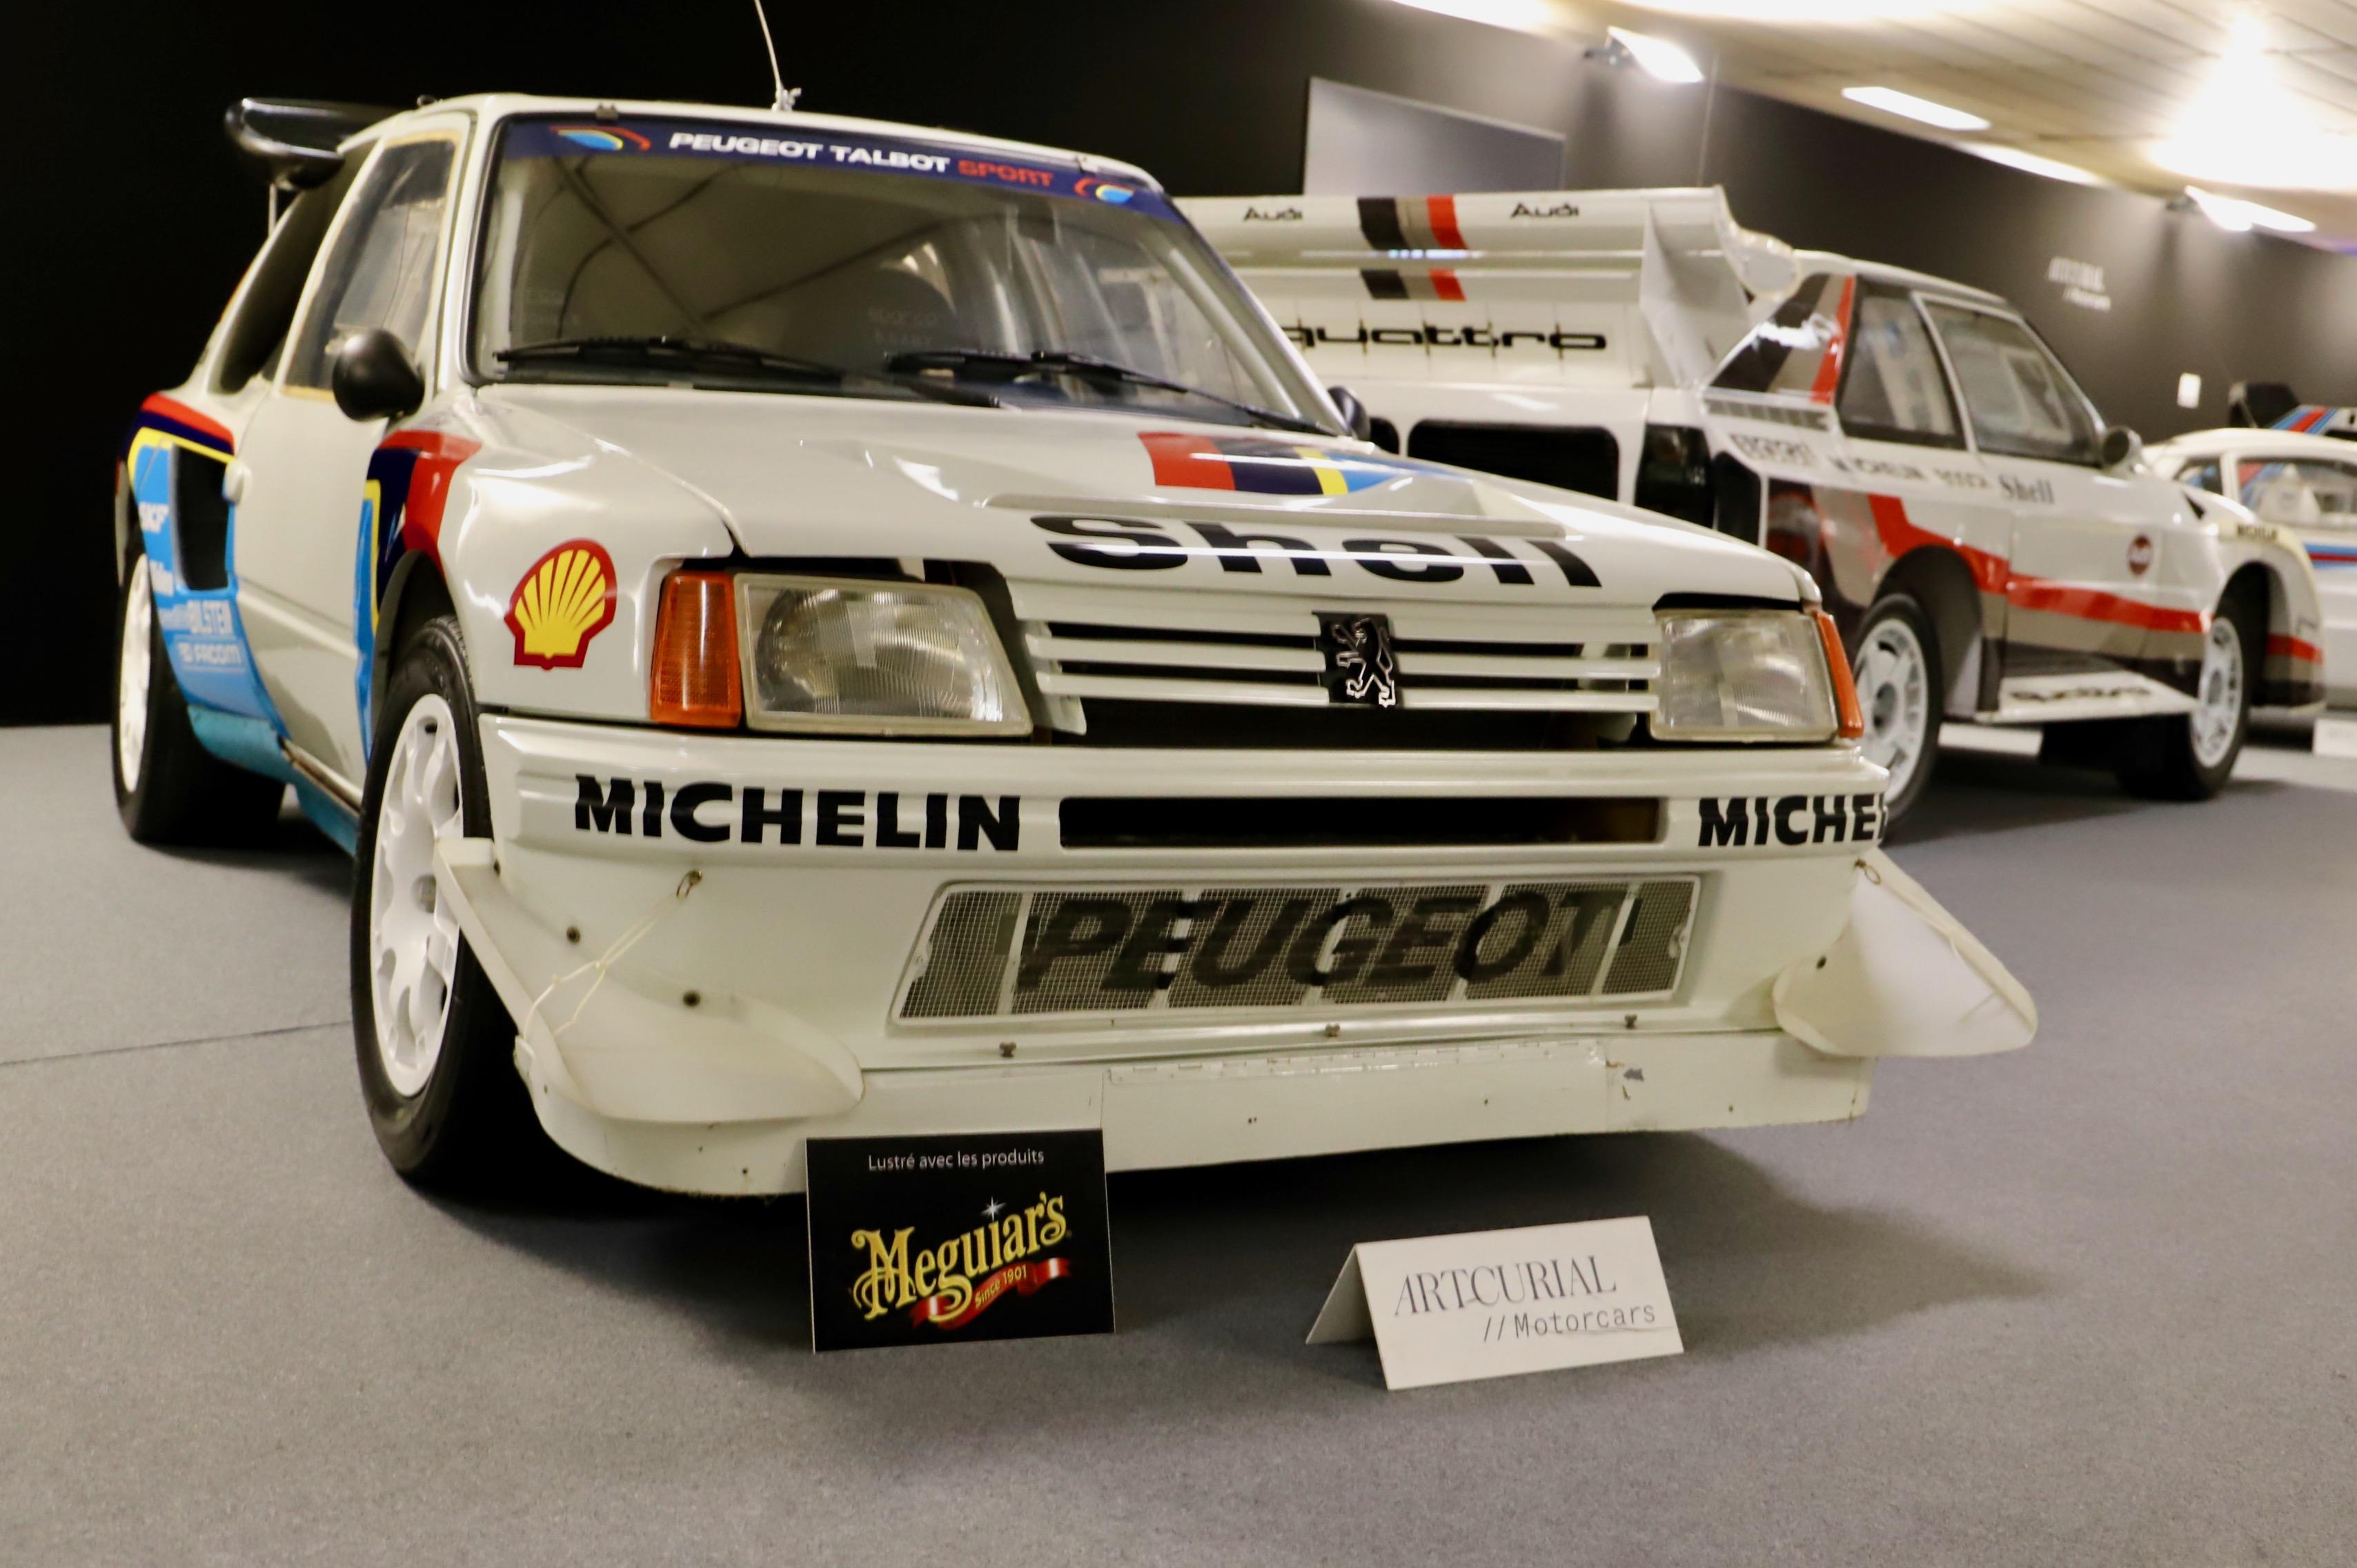 Peugeot 205 Turbo 16 Evolution 2 1985 - La Parisienne 2021 - Motorcars Artcurial - photo Ludo Ferrari